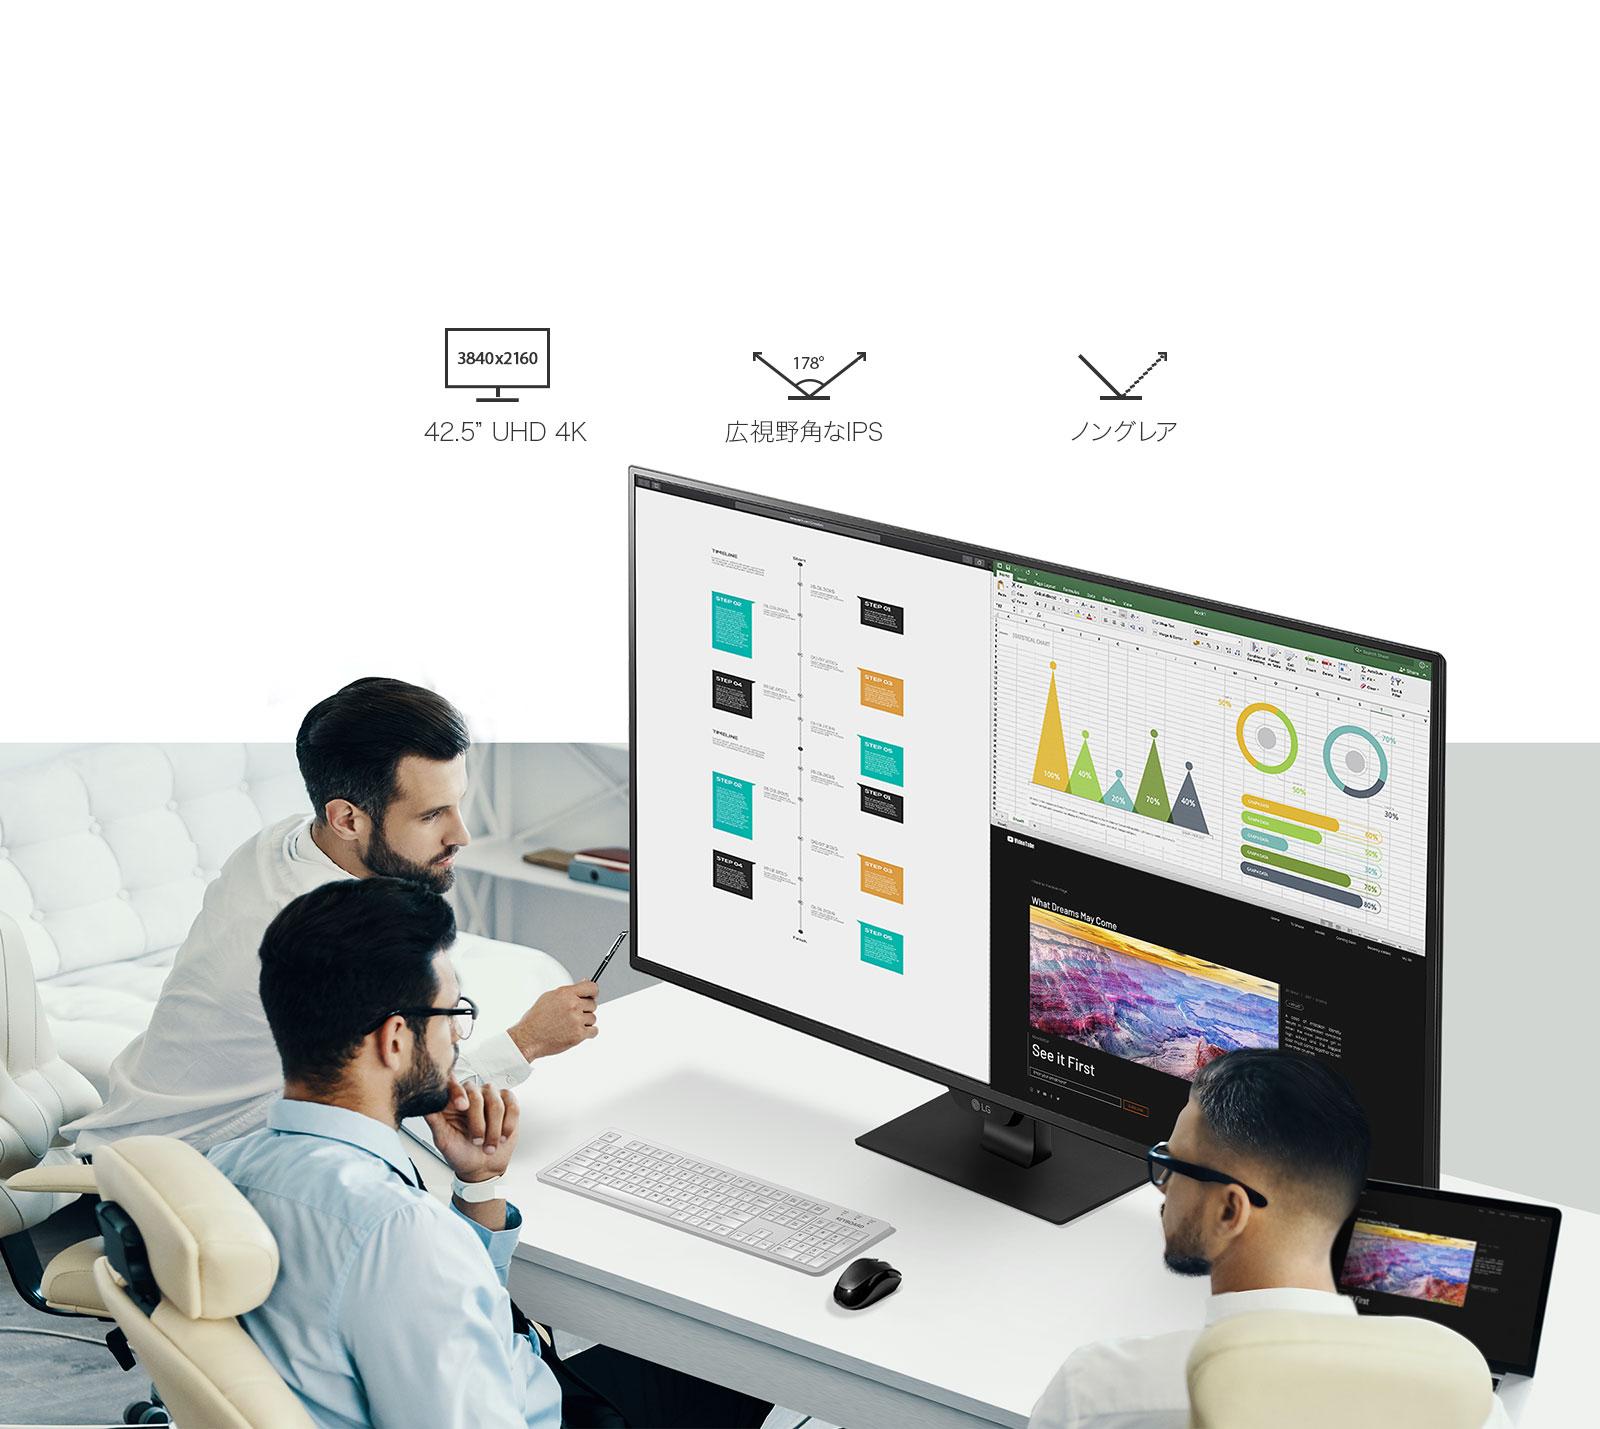 https://www.lg.com/jp/images/monitor/43UN700-B/feature/MNT-43UN700-03-Office-IPS-Anti-Glare-D.jpg